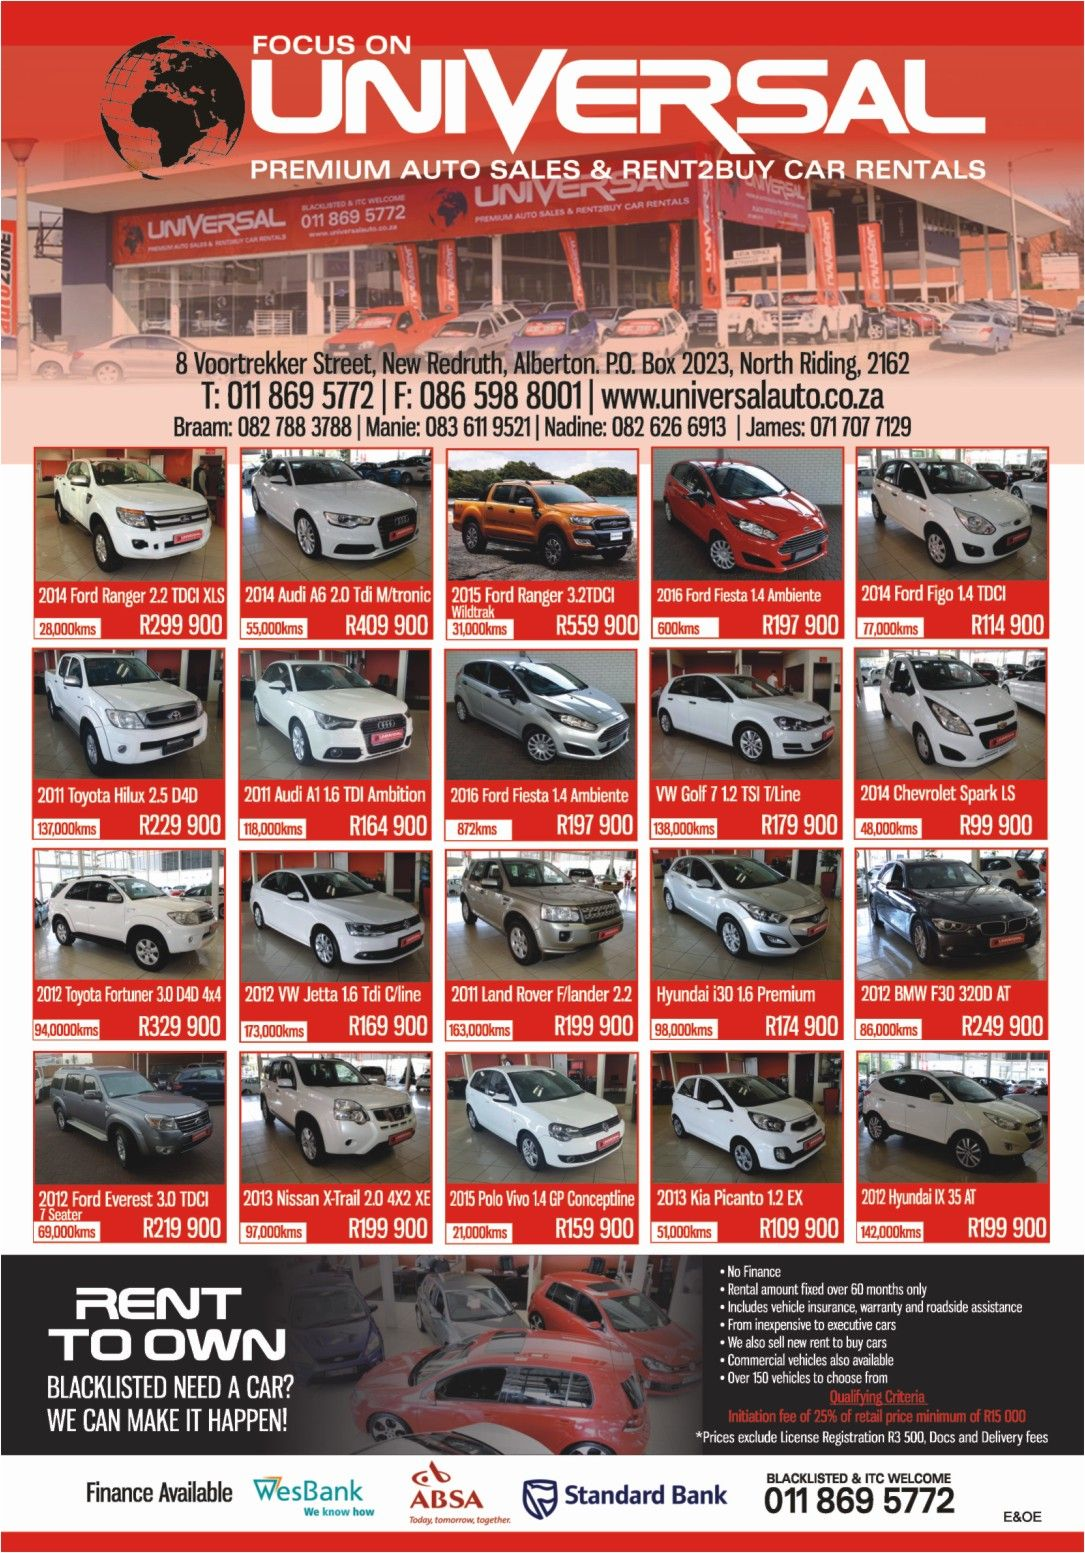 Universal #Auto - #Blacklisted & #ITC Welcome! Premium Auto Sales ...